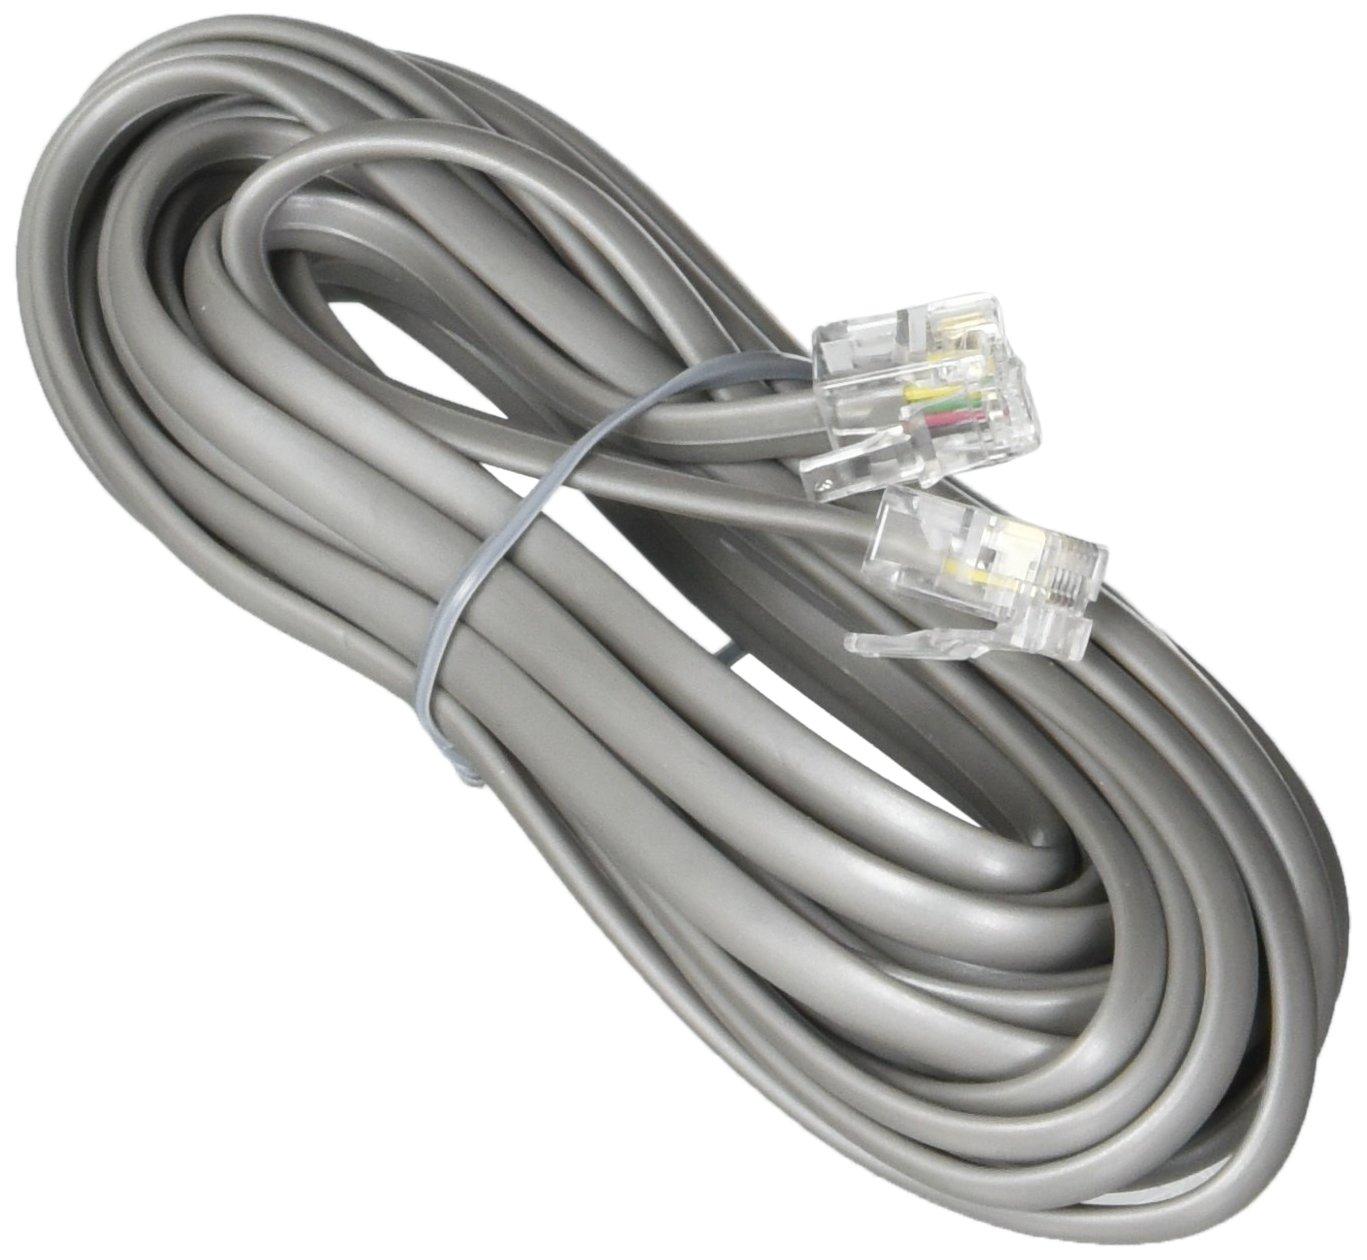 Amazon.com: UpBright® NEW AC Adapter For AT&T ATT ML17929 ML 17929 ...